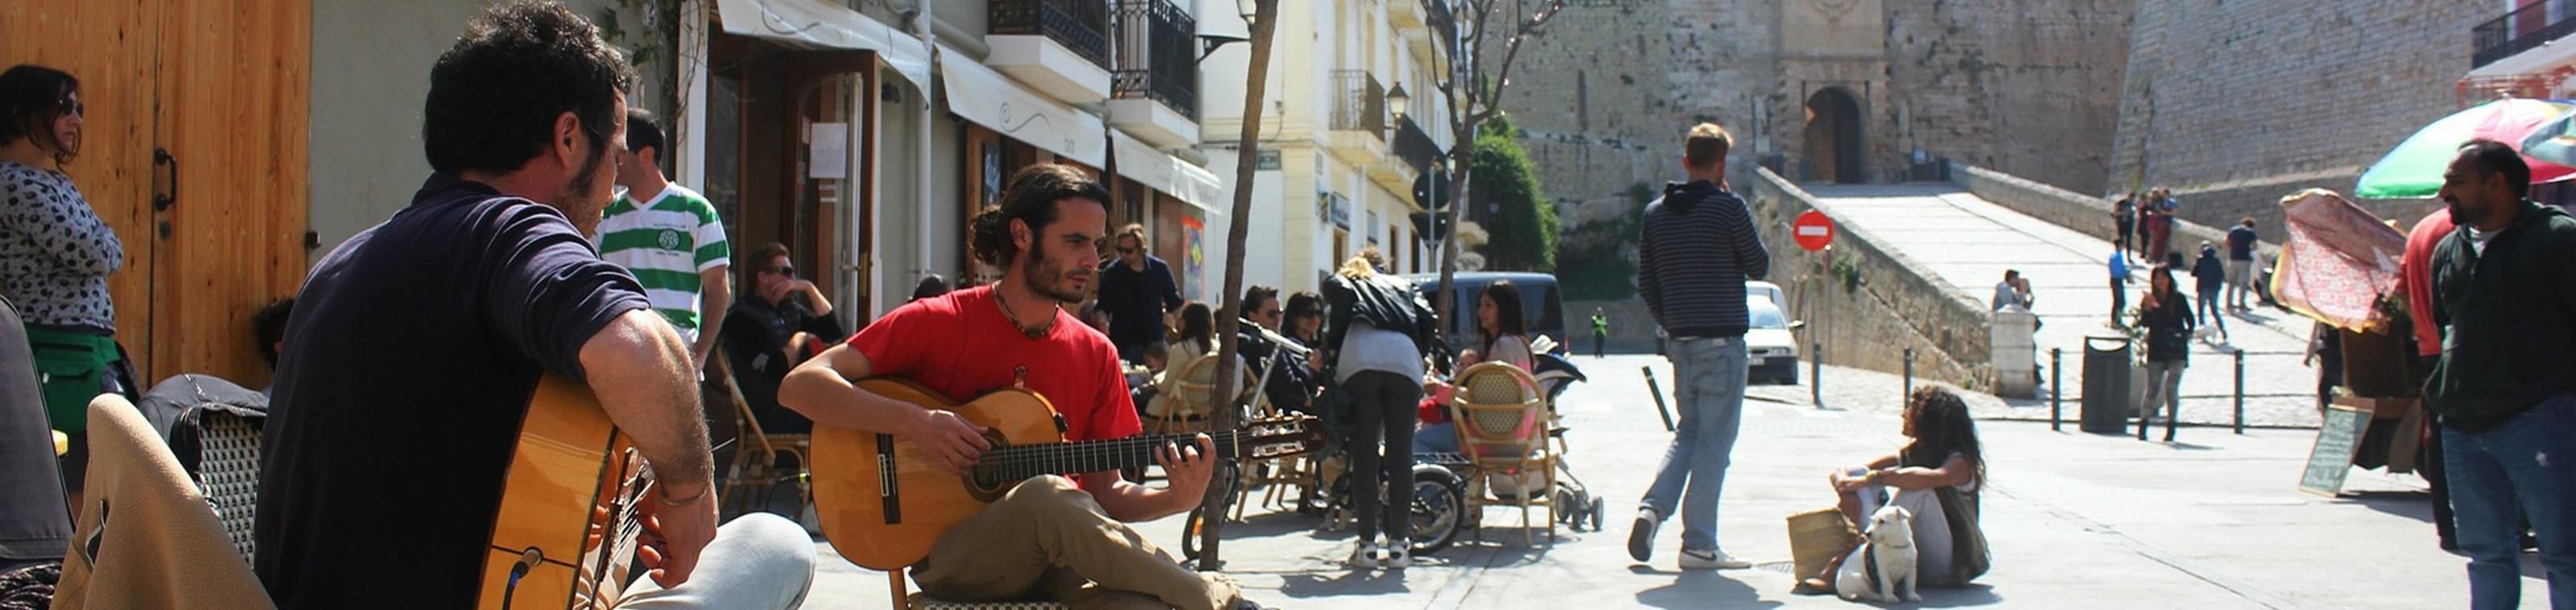 Spanje